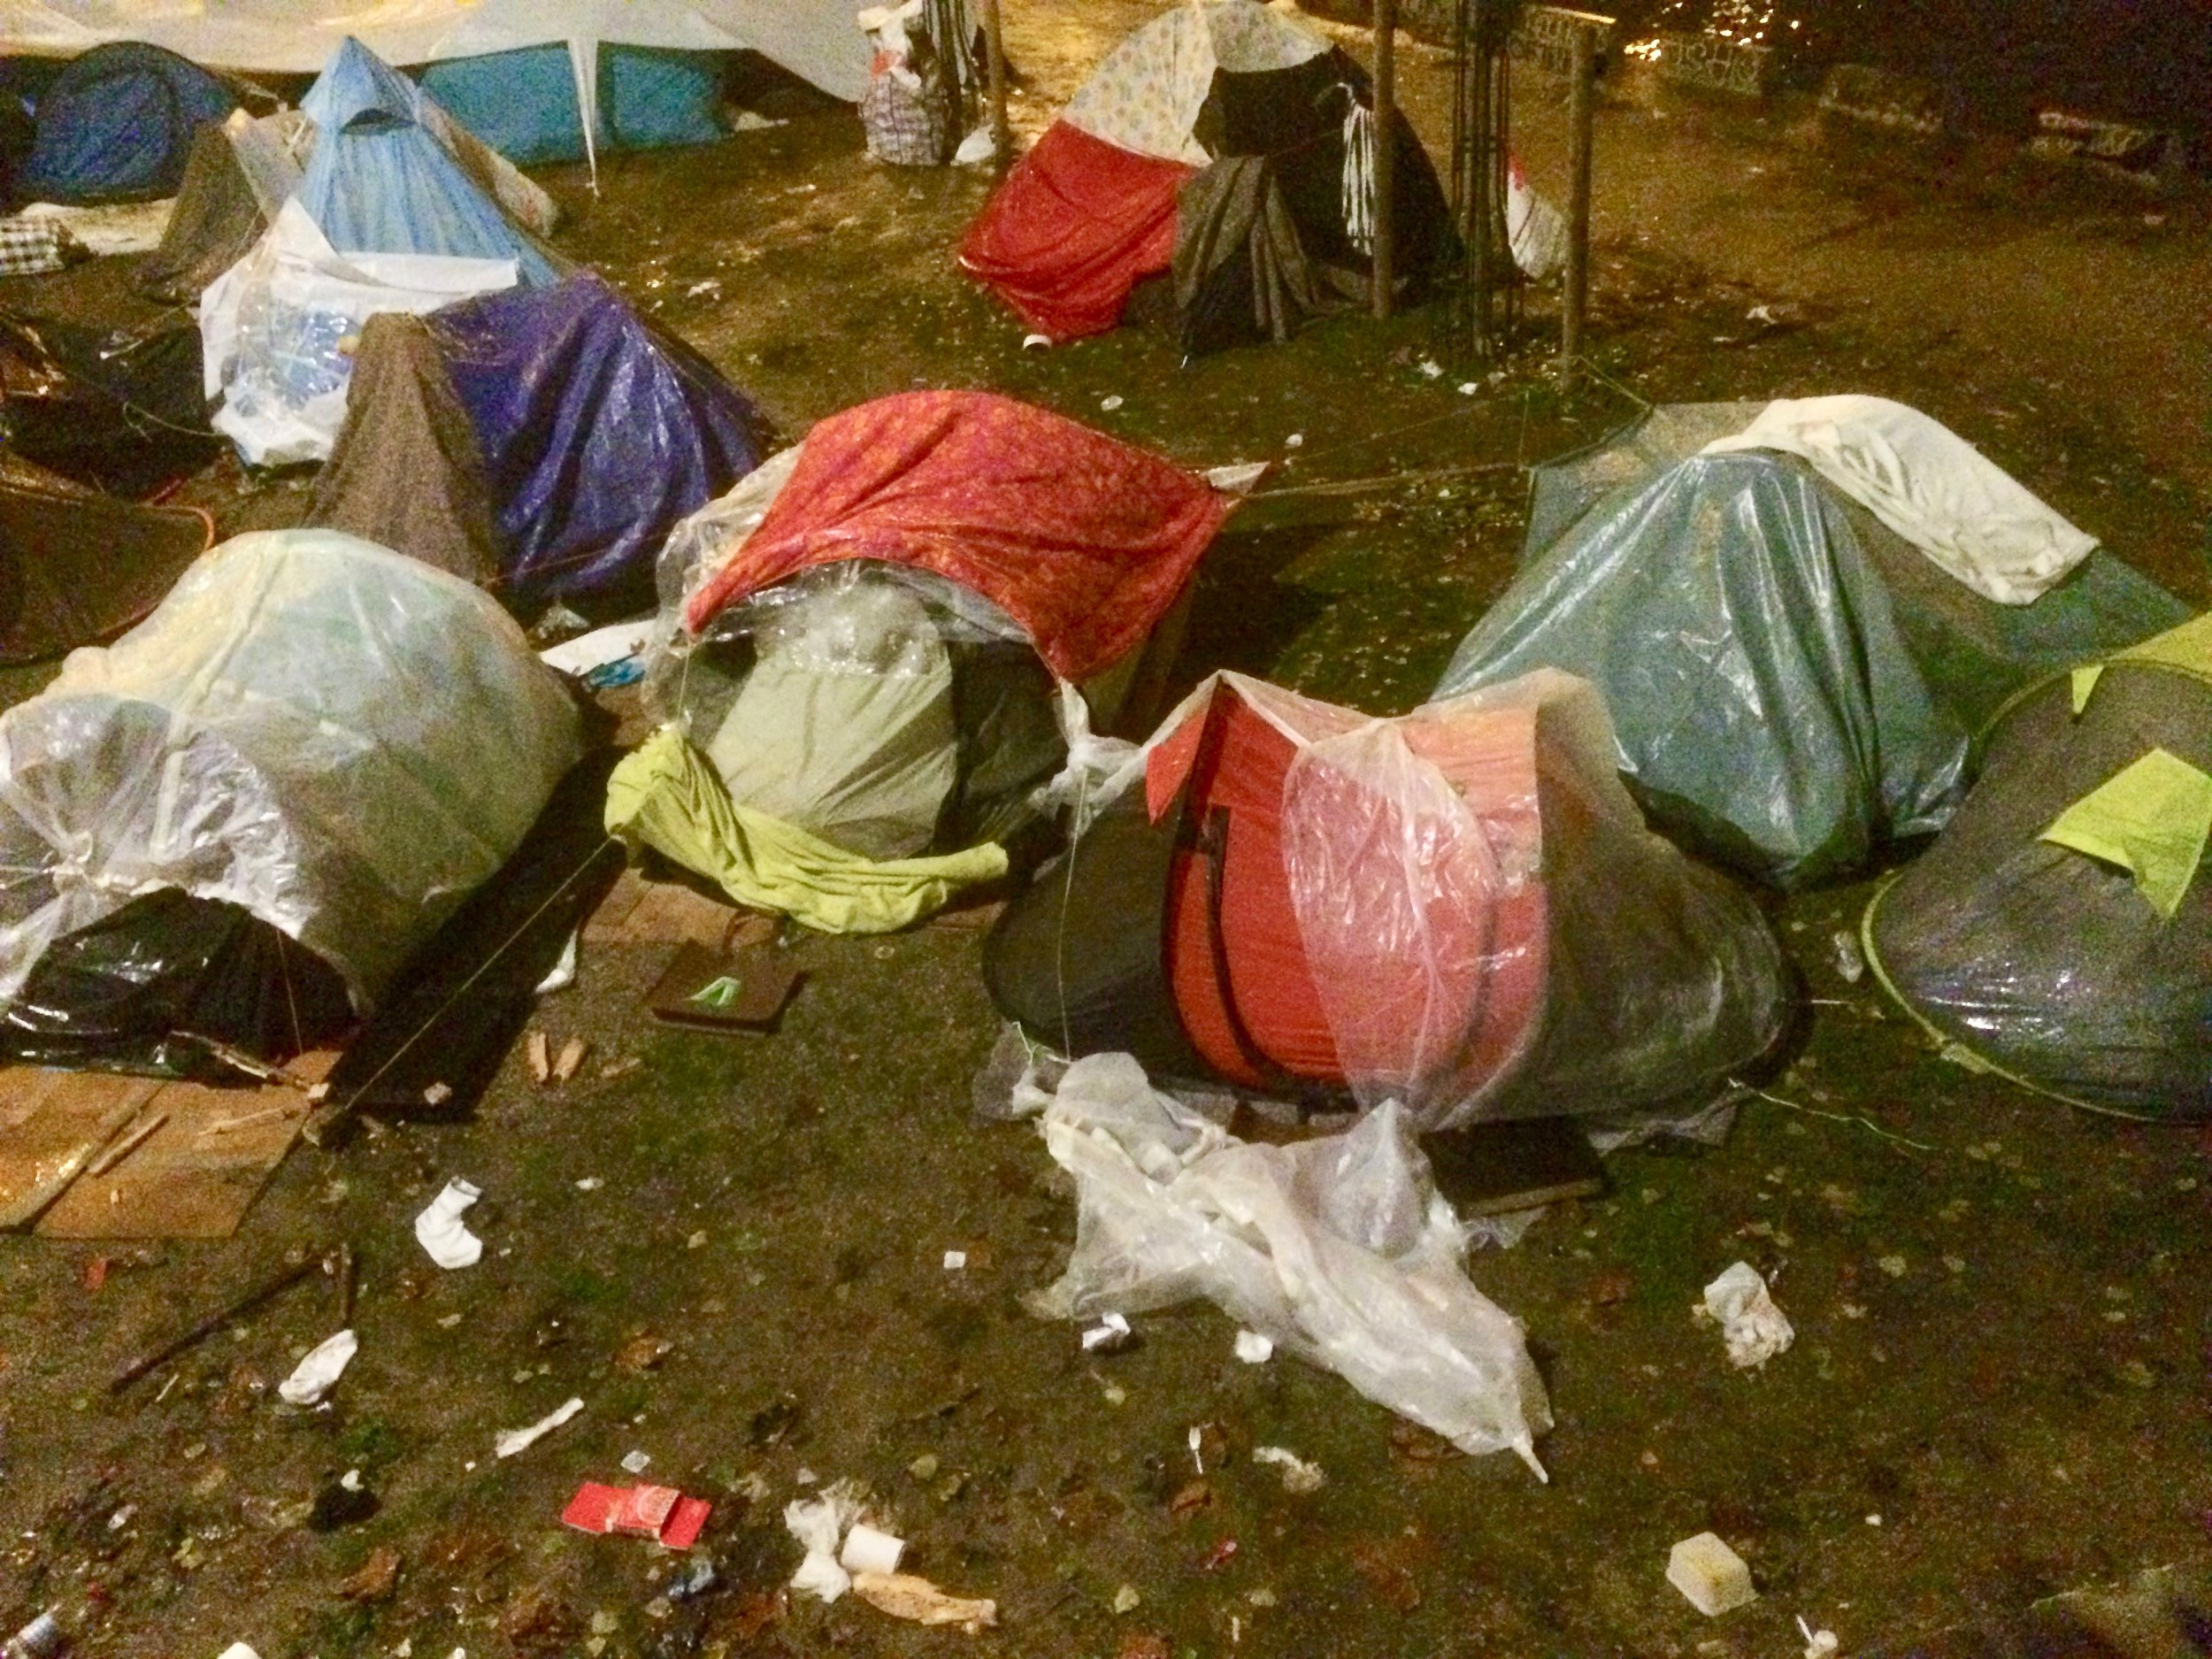 Tents_Paris_december_2017.jpg